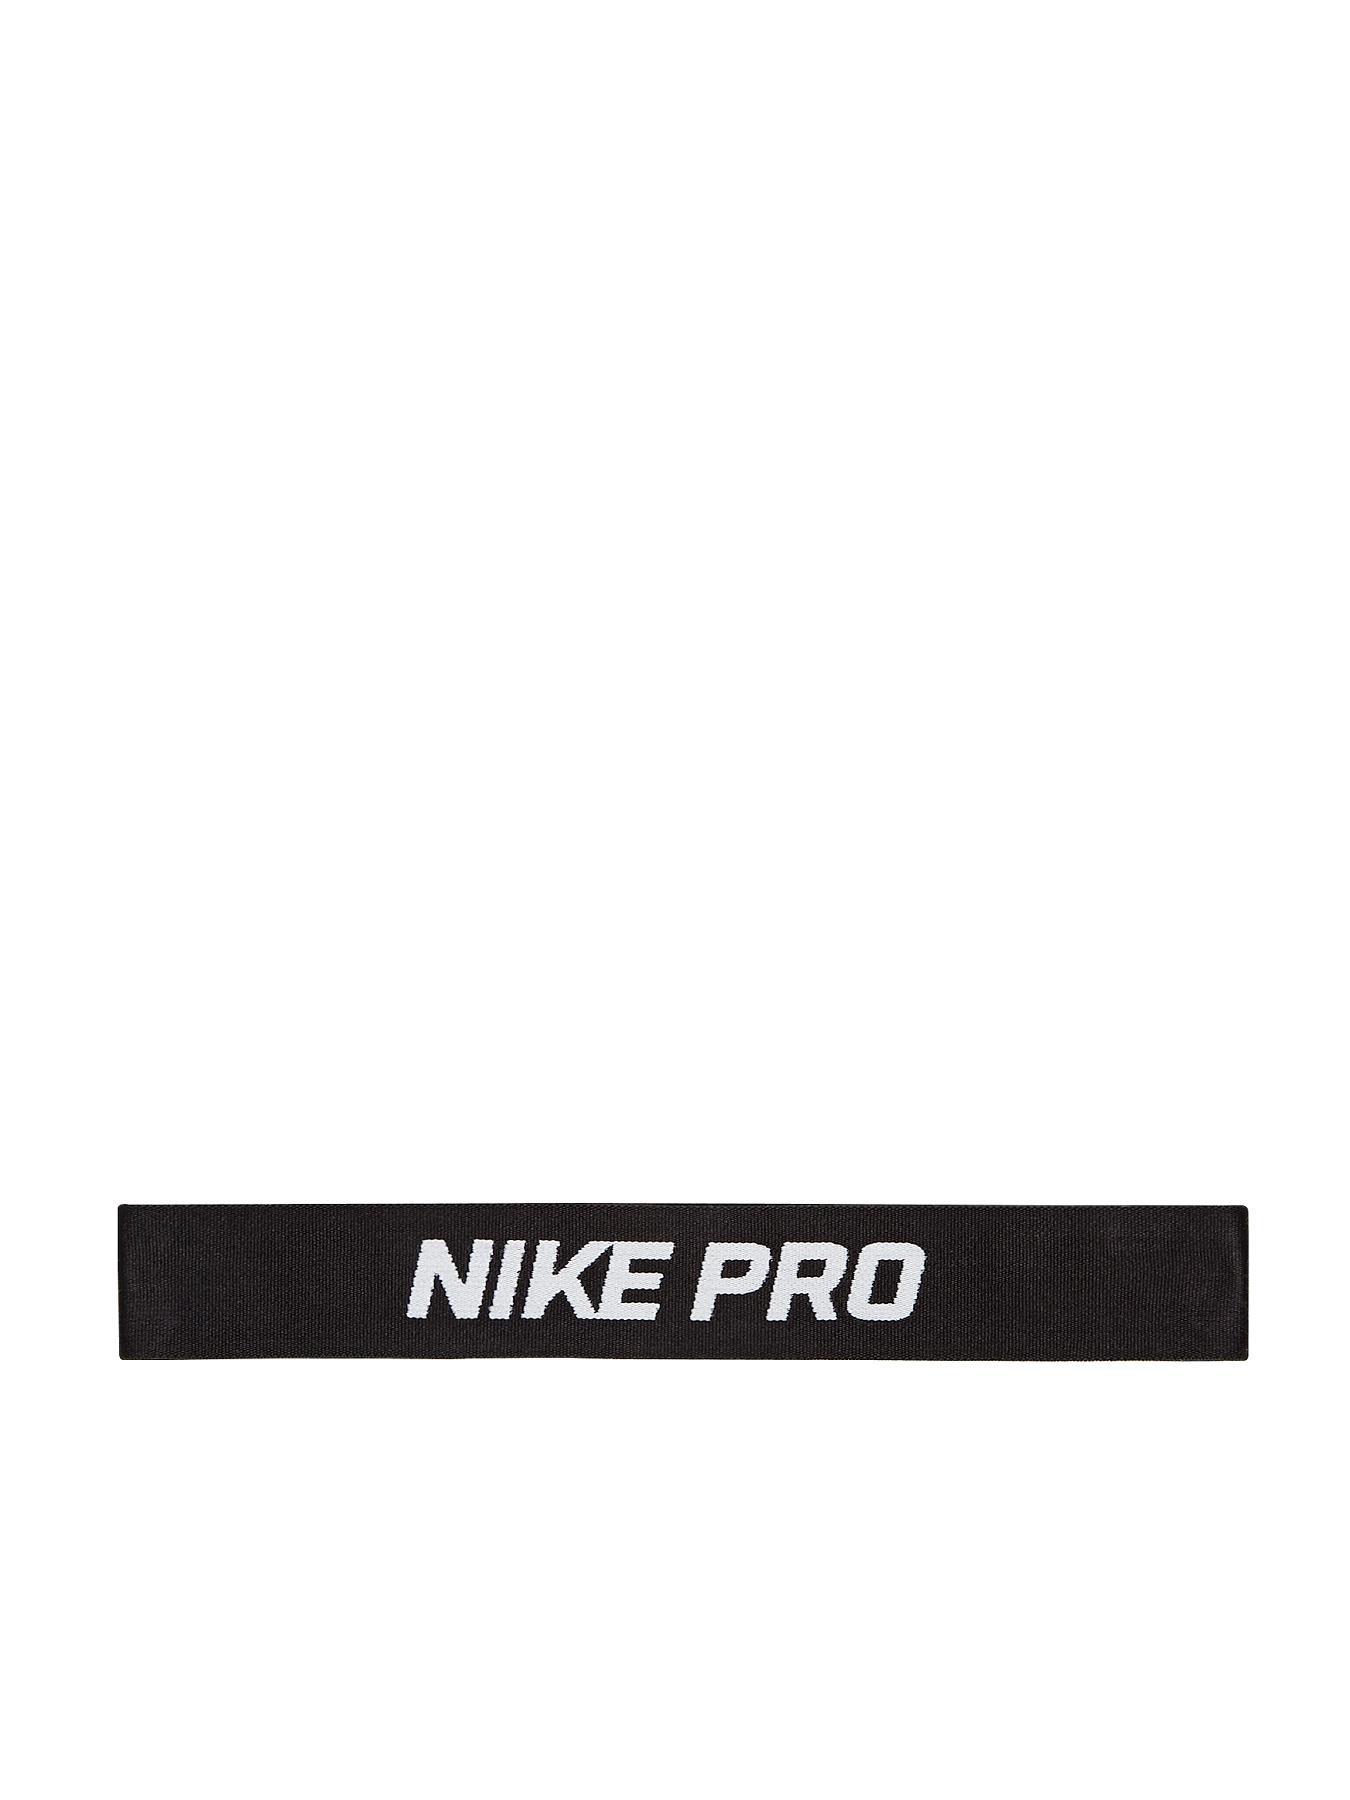 Nike Pro Headband - Black, Black